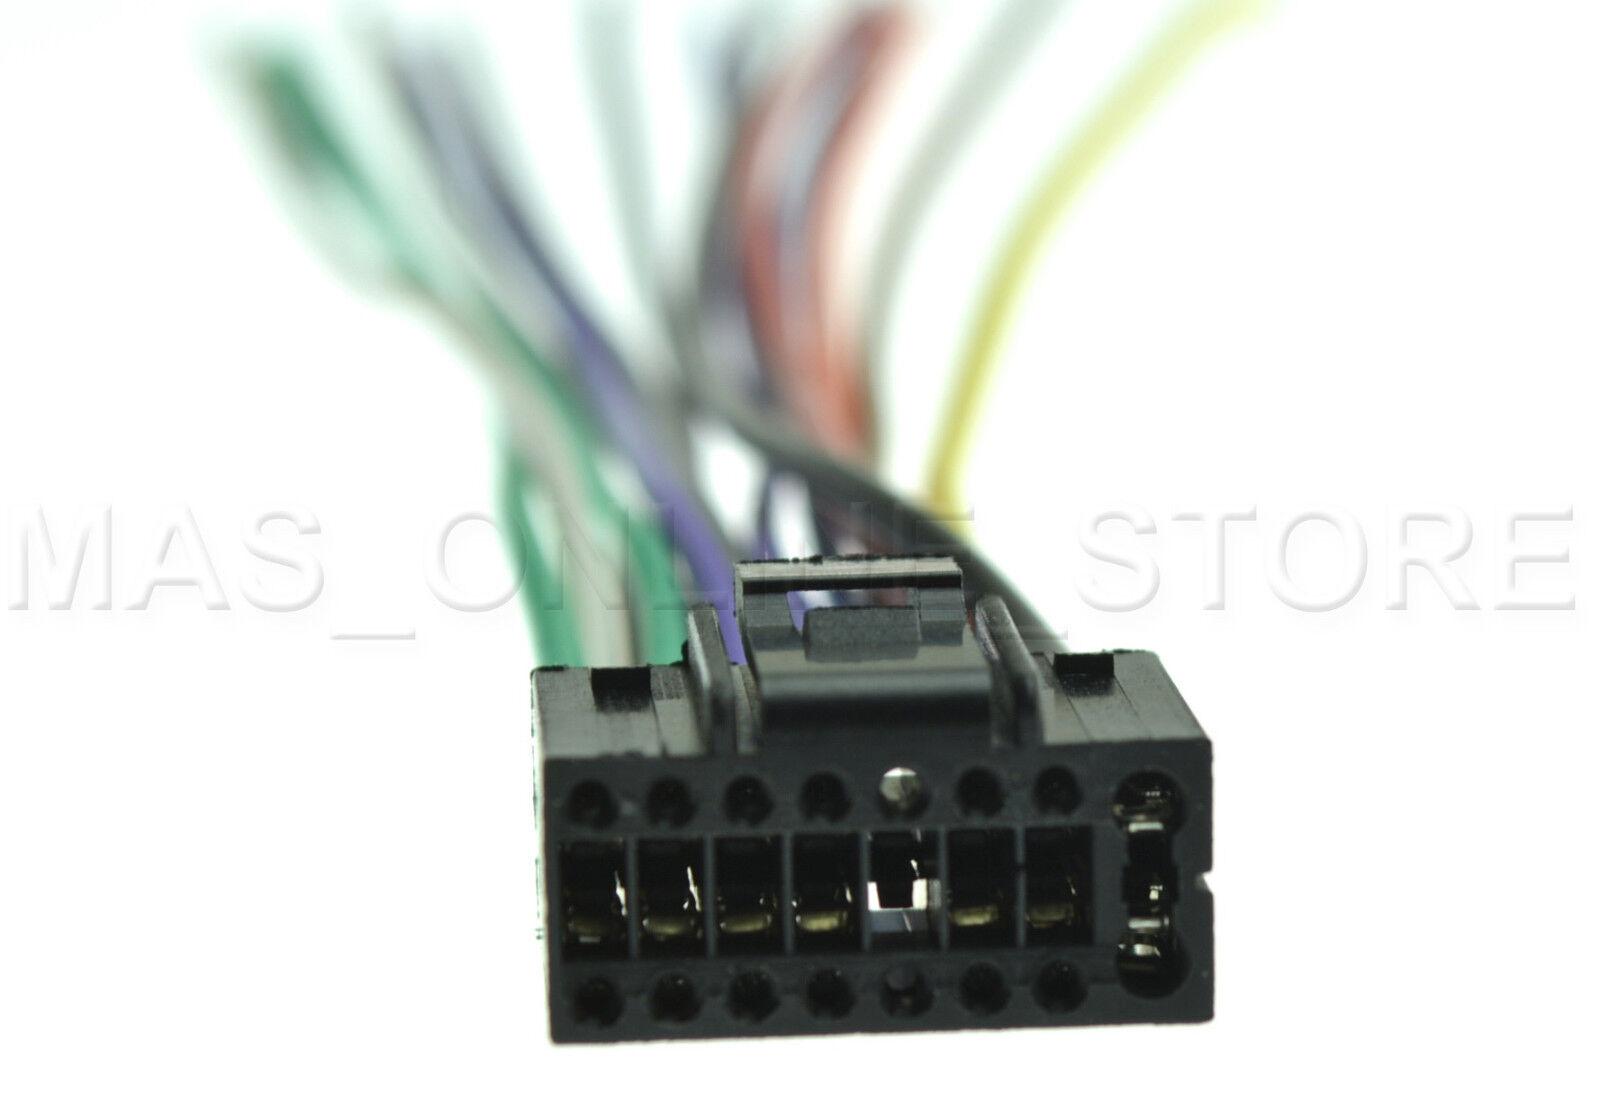 Jvc Kd R860Bt Wiring Diagram from i.ebayimg.com